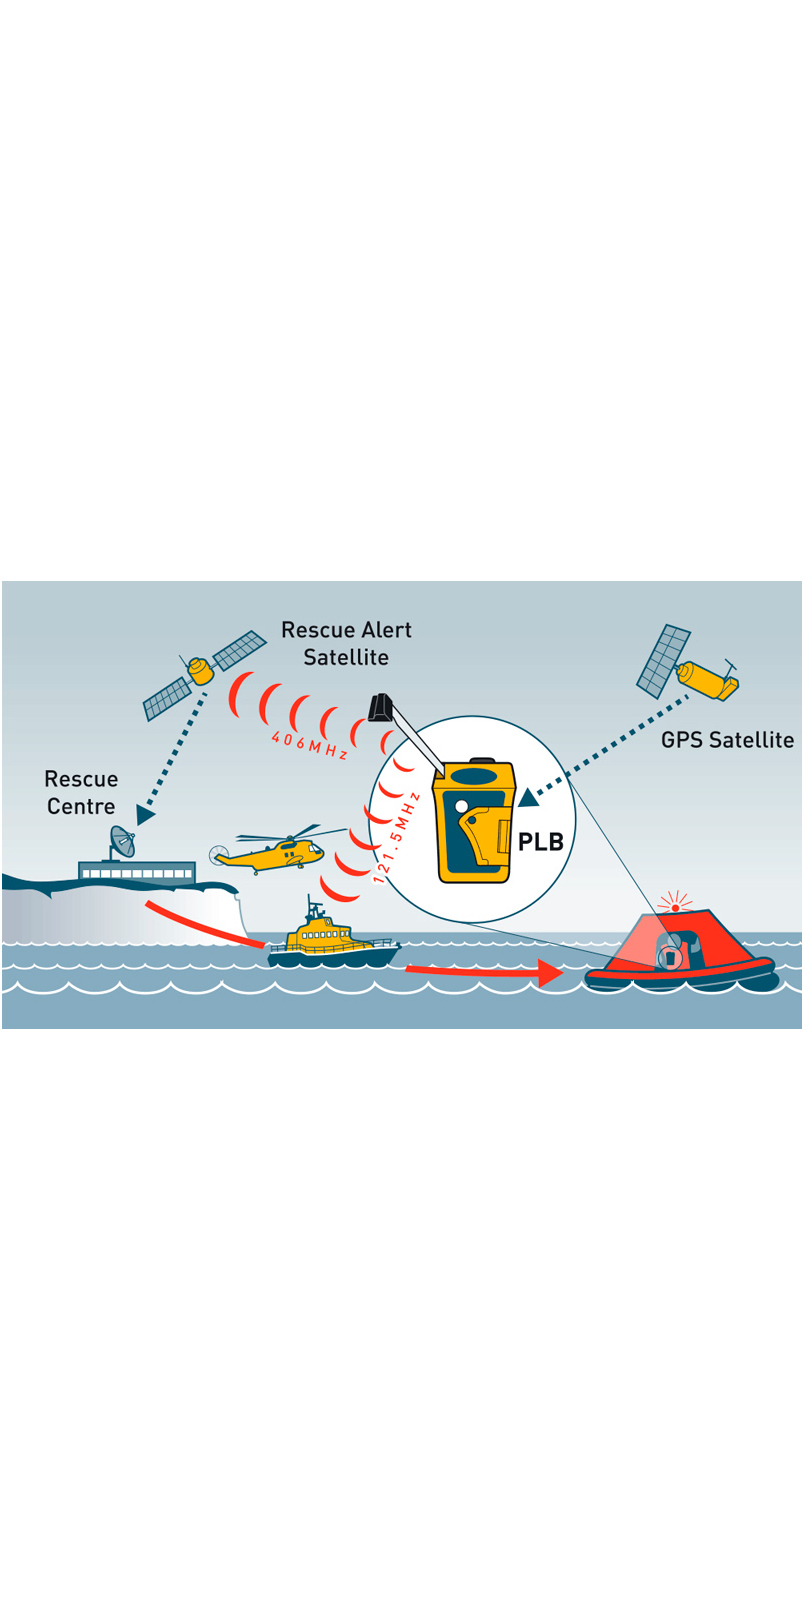 2020 Ocean Signal Rescue Me 406 Plb1 - Epi3110